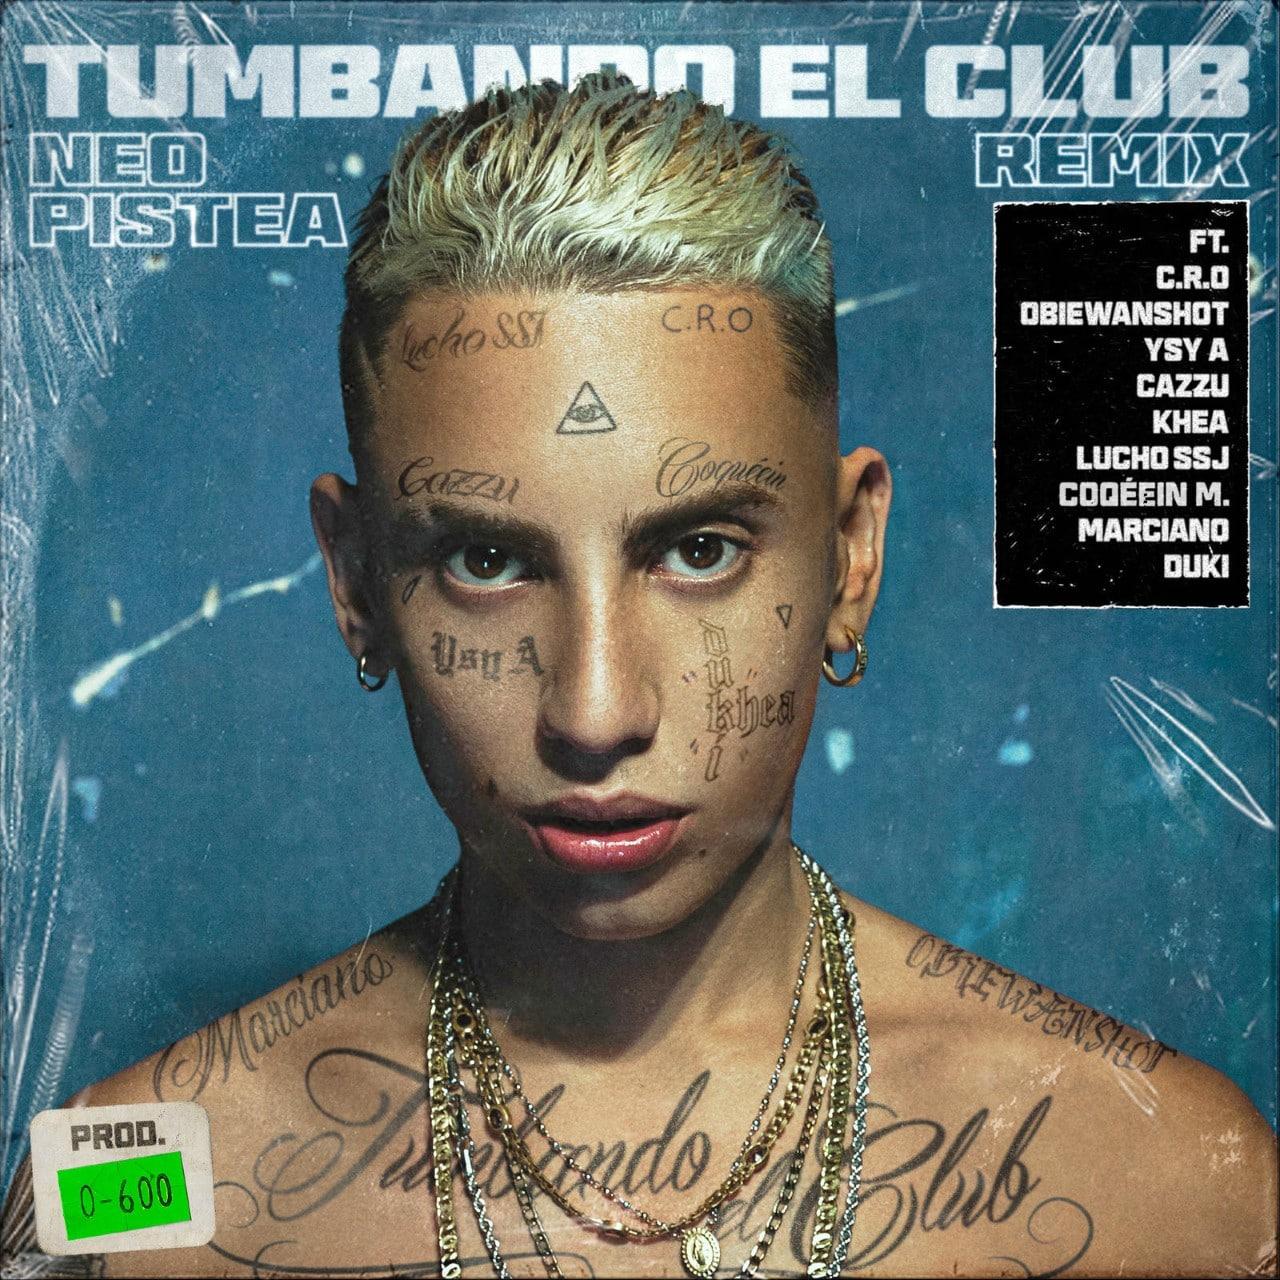 Neo Pistea TUMBANDO EL CLUB REMIX